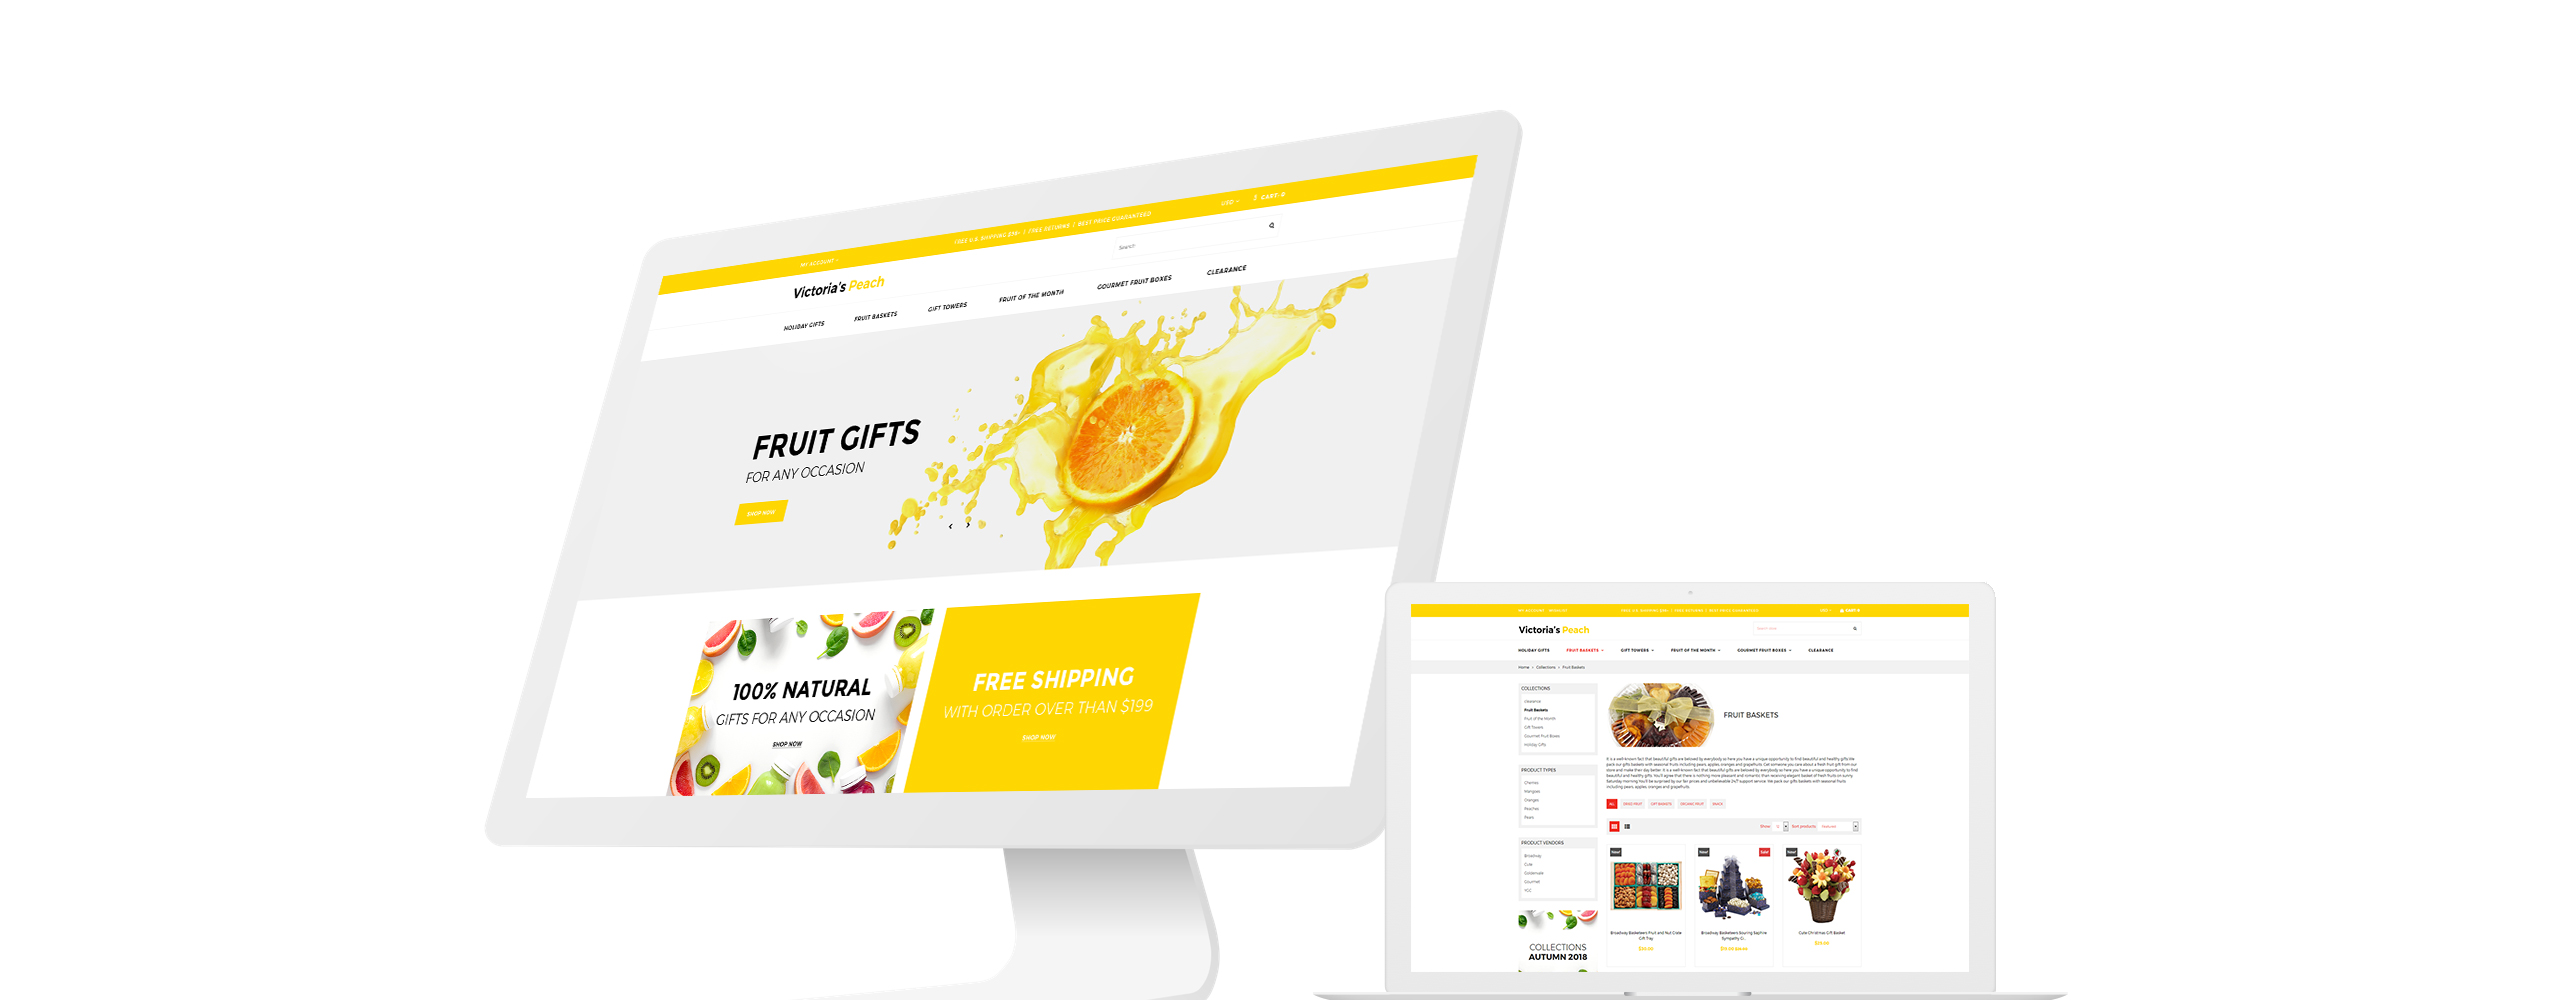 Website Design Template 71026 - sweets souvenir store